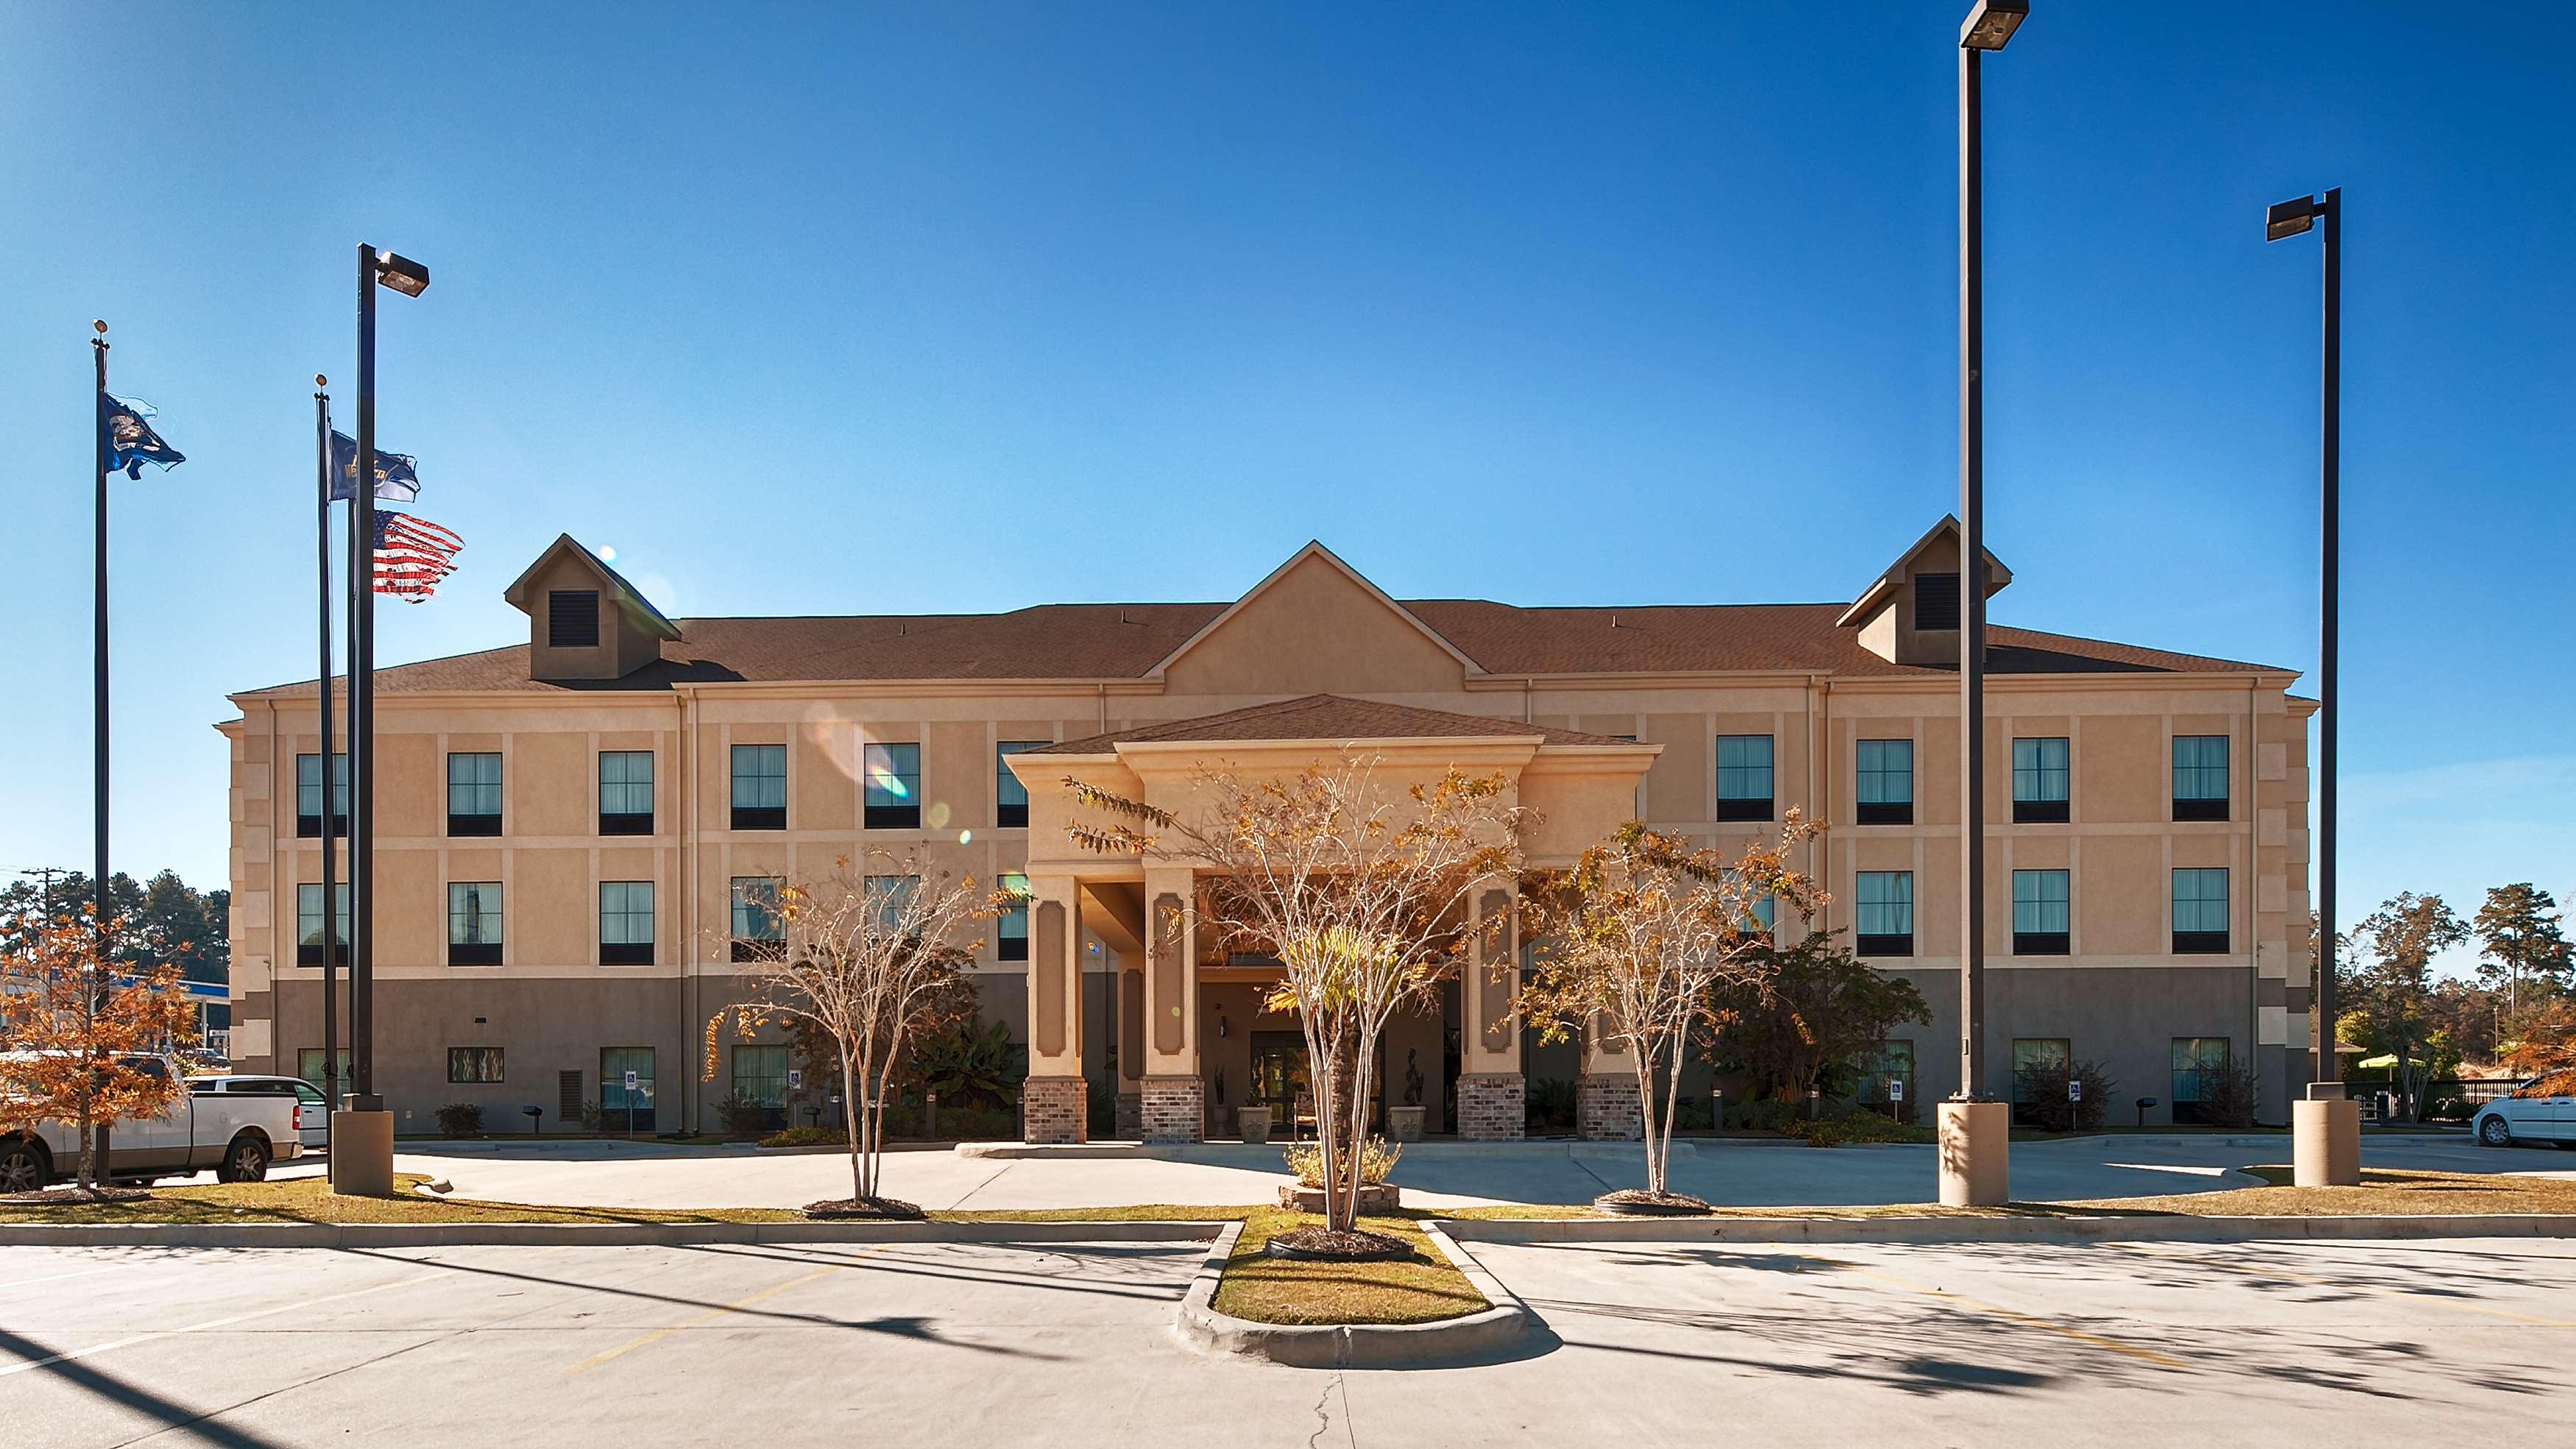 Best Western St. Francisville Hotel image 2